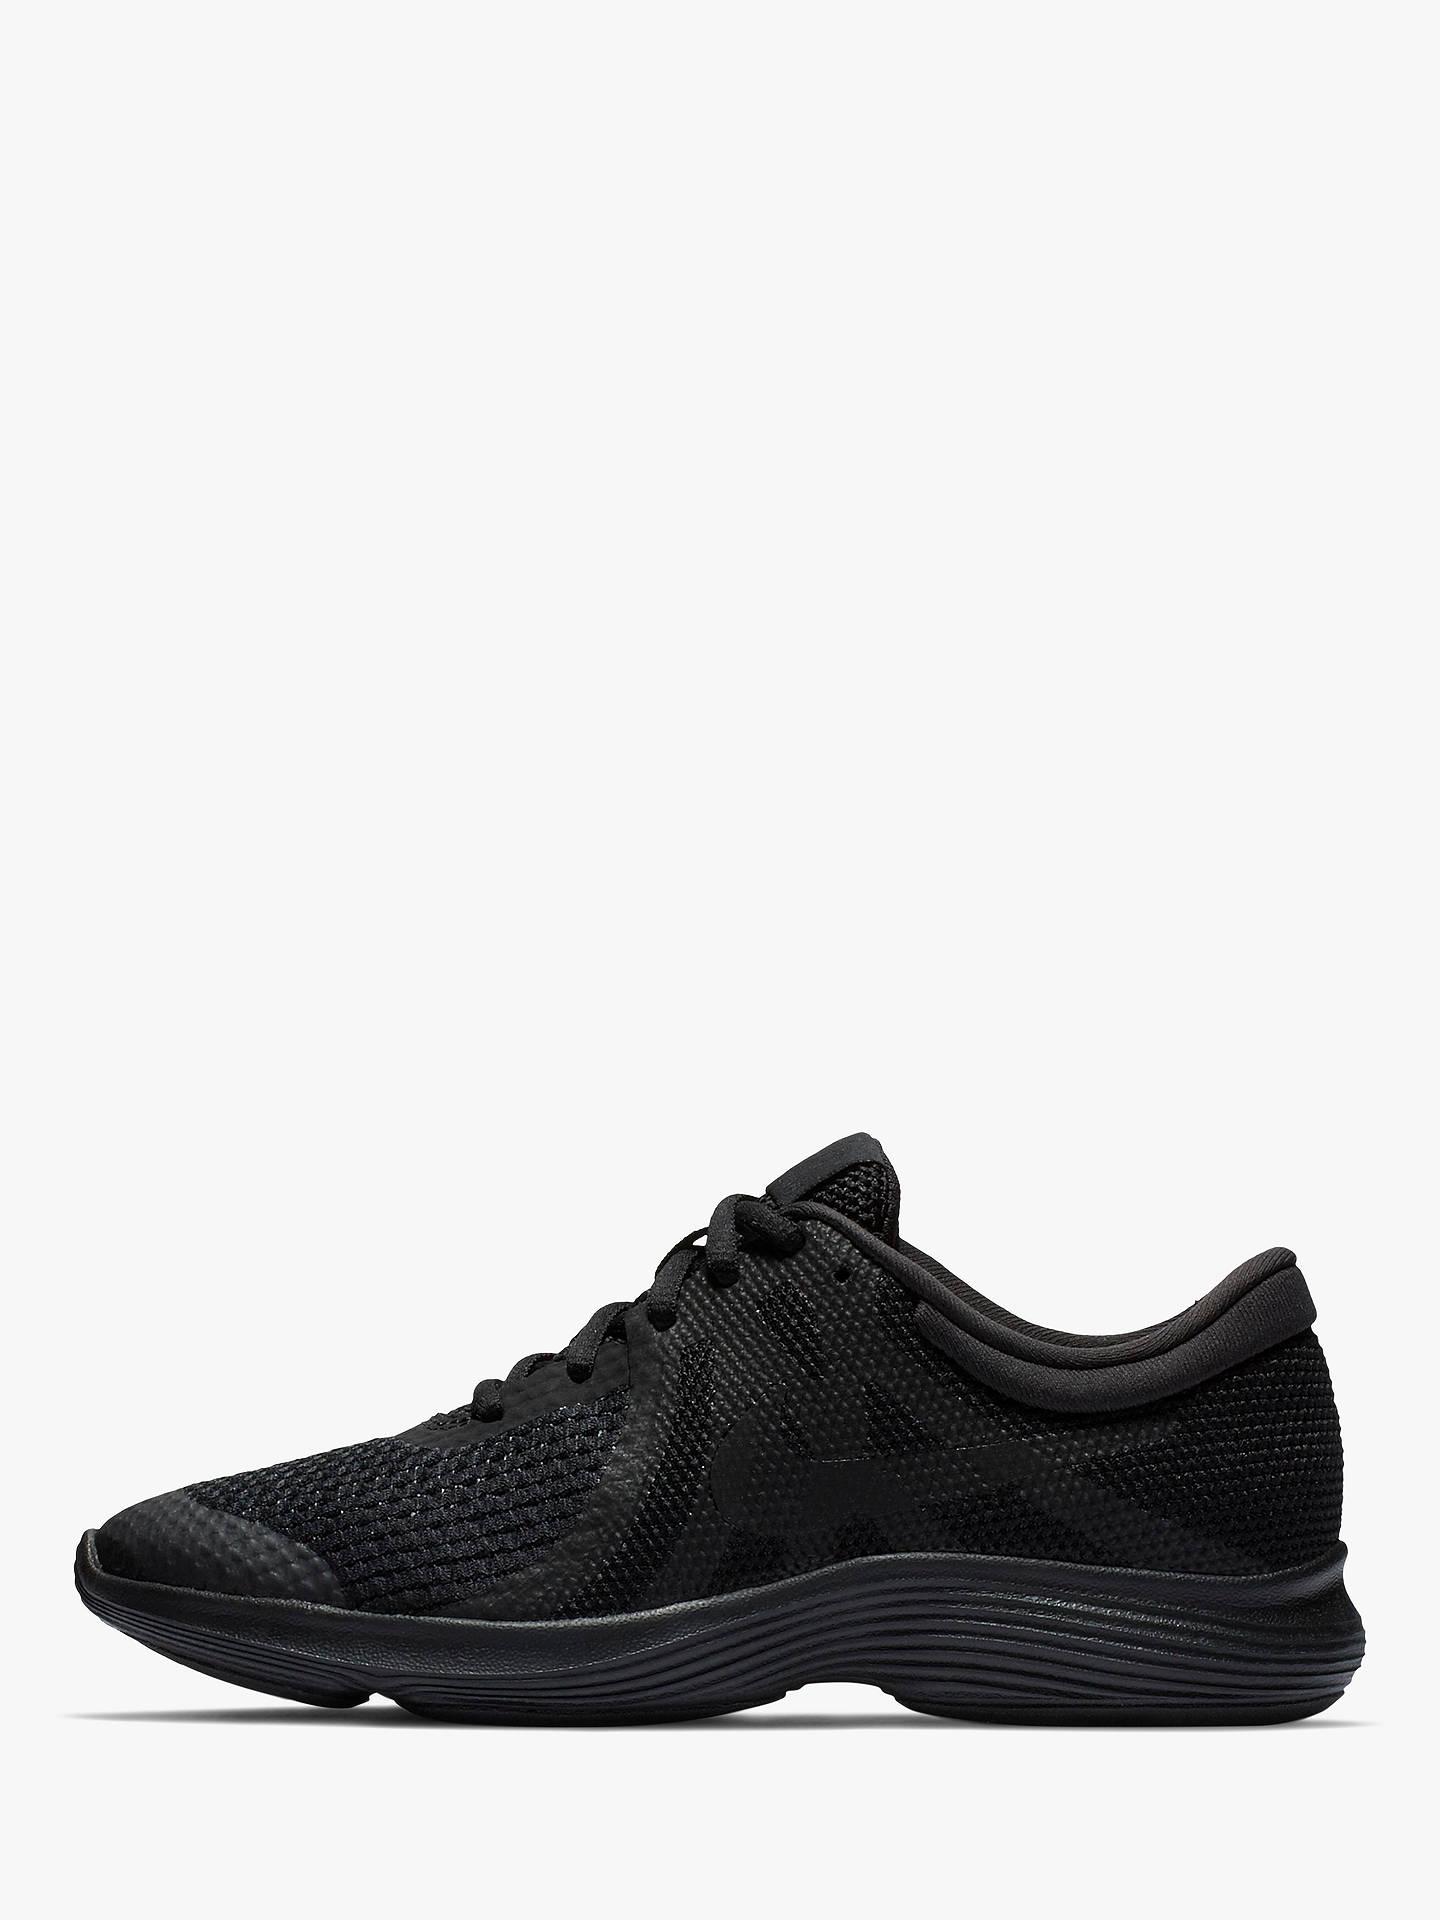 21618524b2c1 ... Buy Nike Children s Revolution 4 Trainers